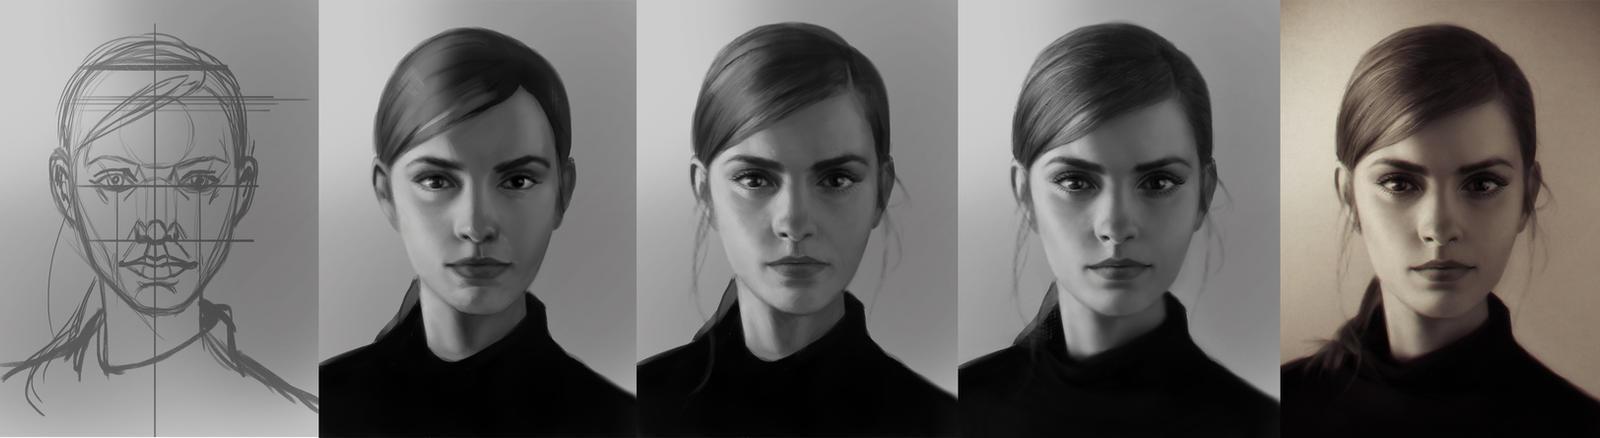 Emmasteps by Dark-Adon